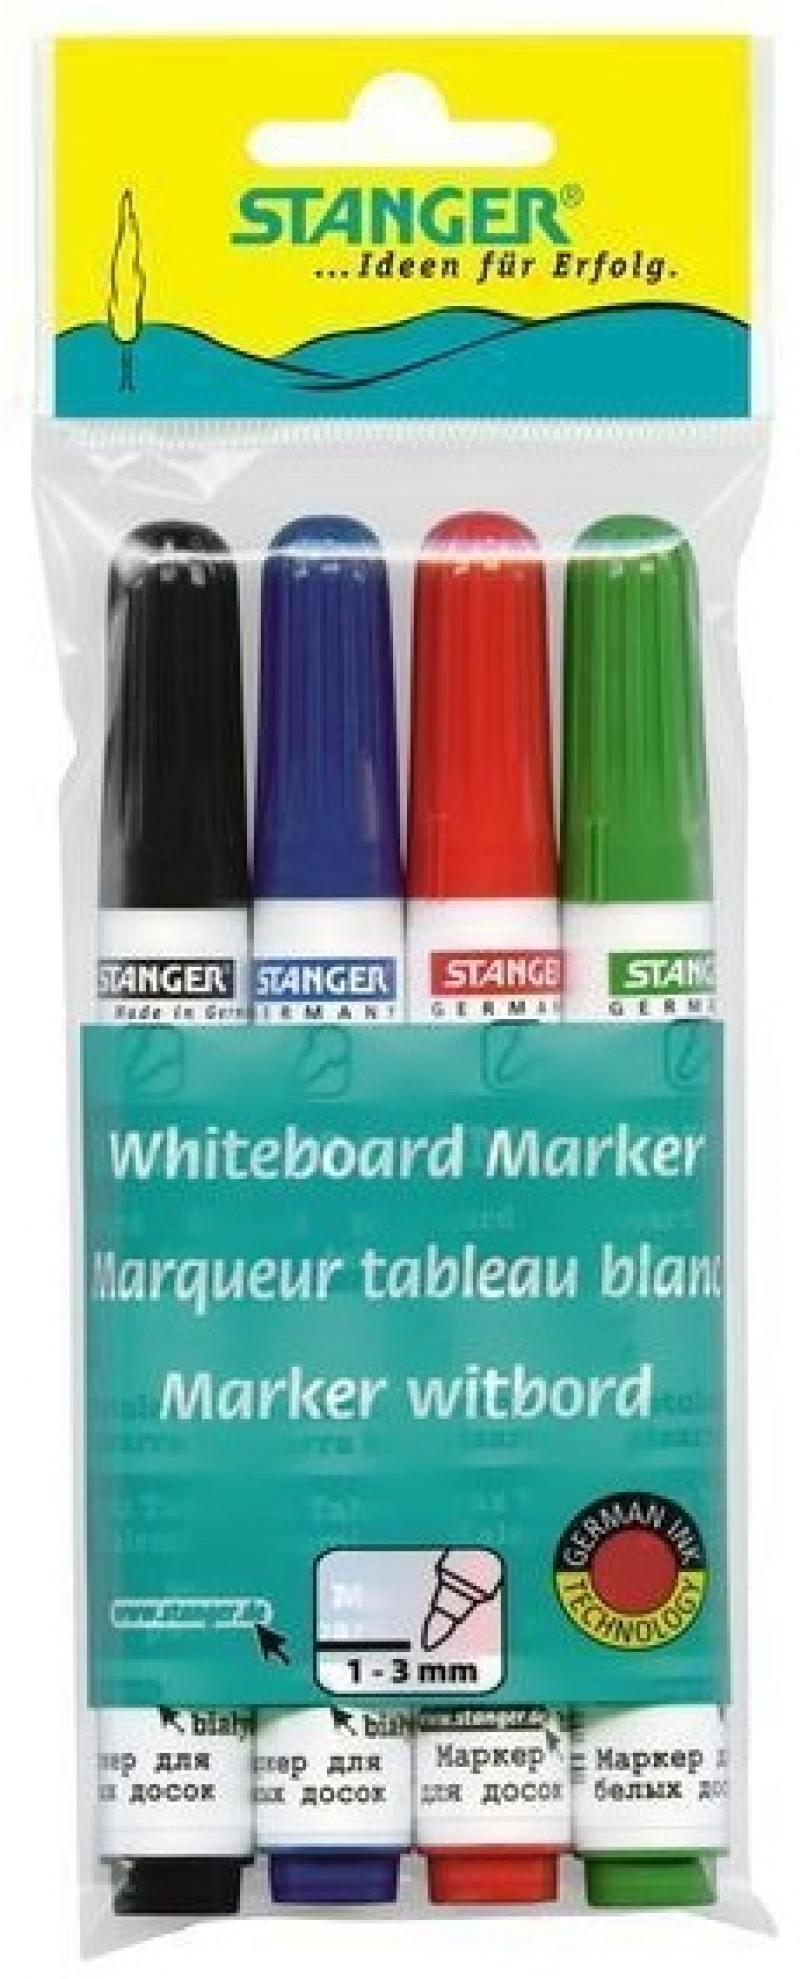 Маркер для доски Stanger BM240 3 мм 4 шт разноцветный 321002 321002 маркер для доски stanger bm240 3 мм 4 шт разноцветный 321002